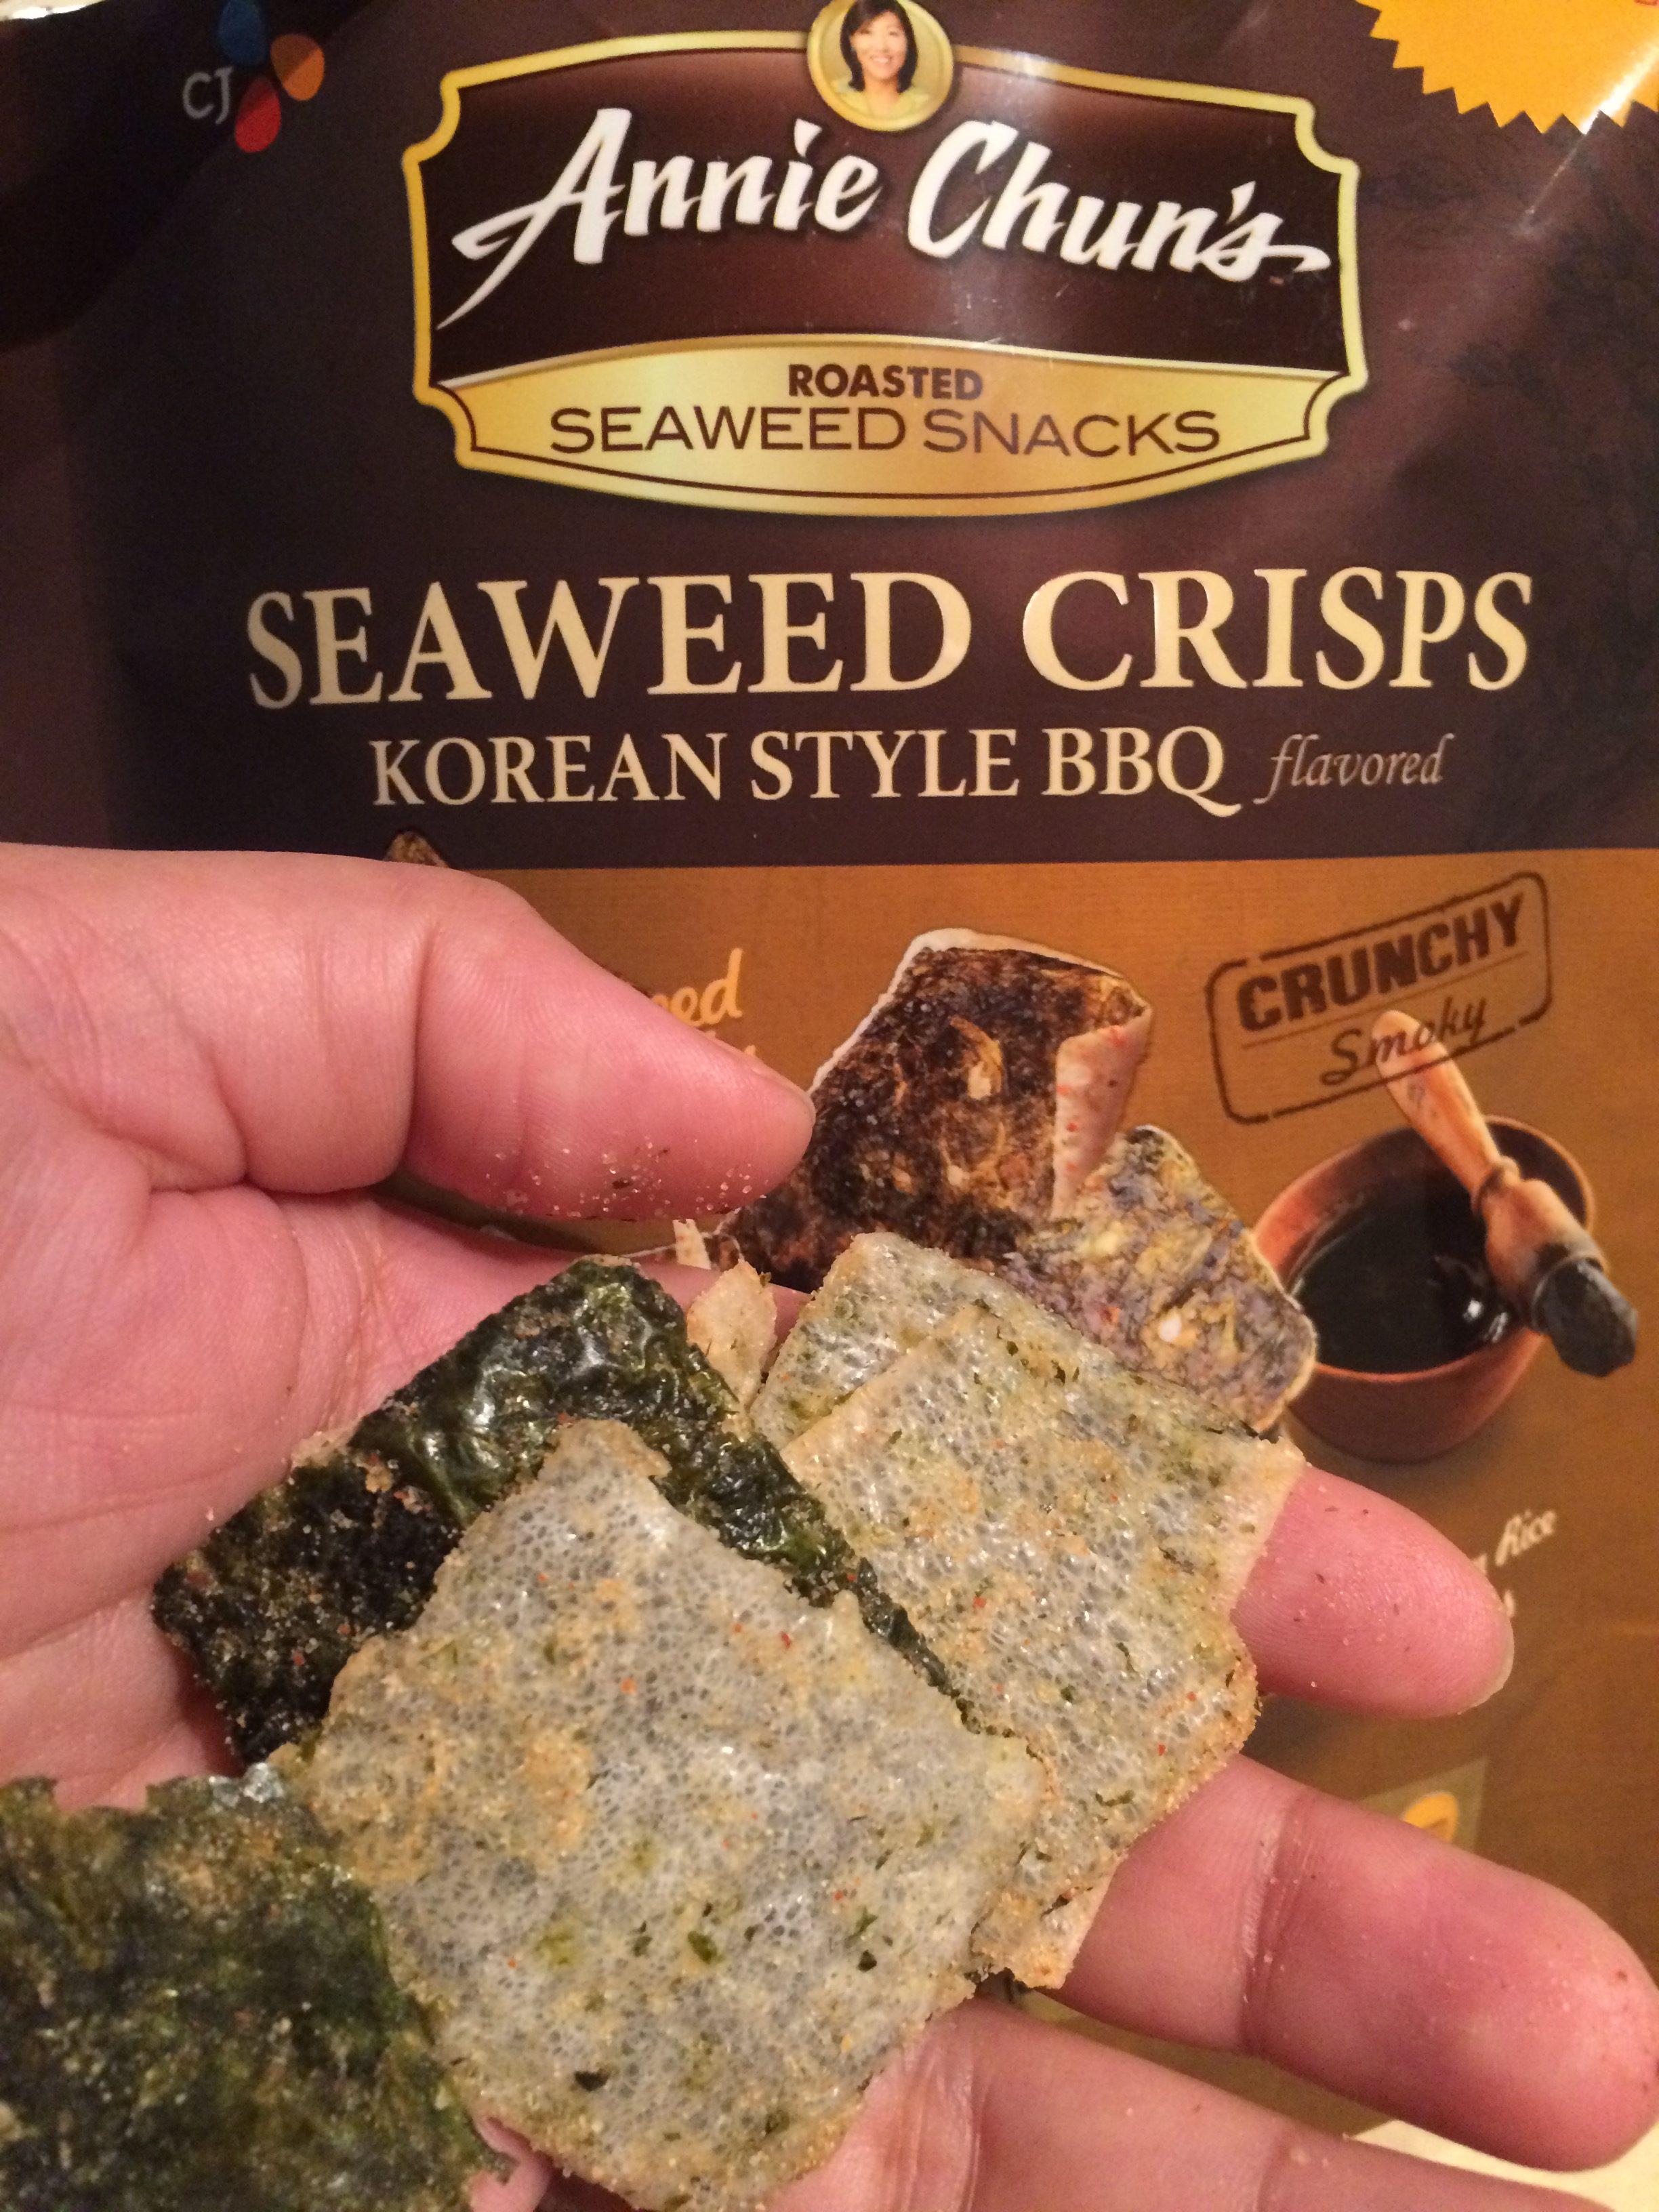 annie chun's seaweed crisps healthy snack